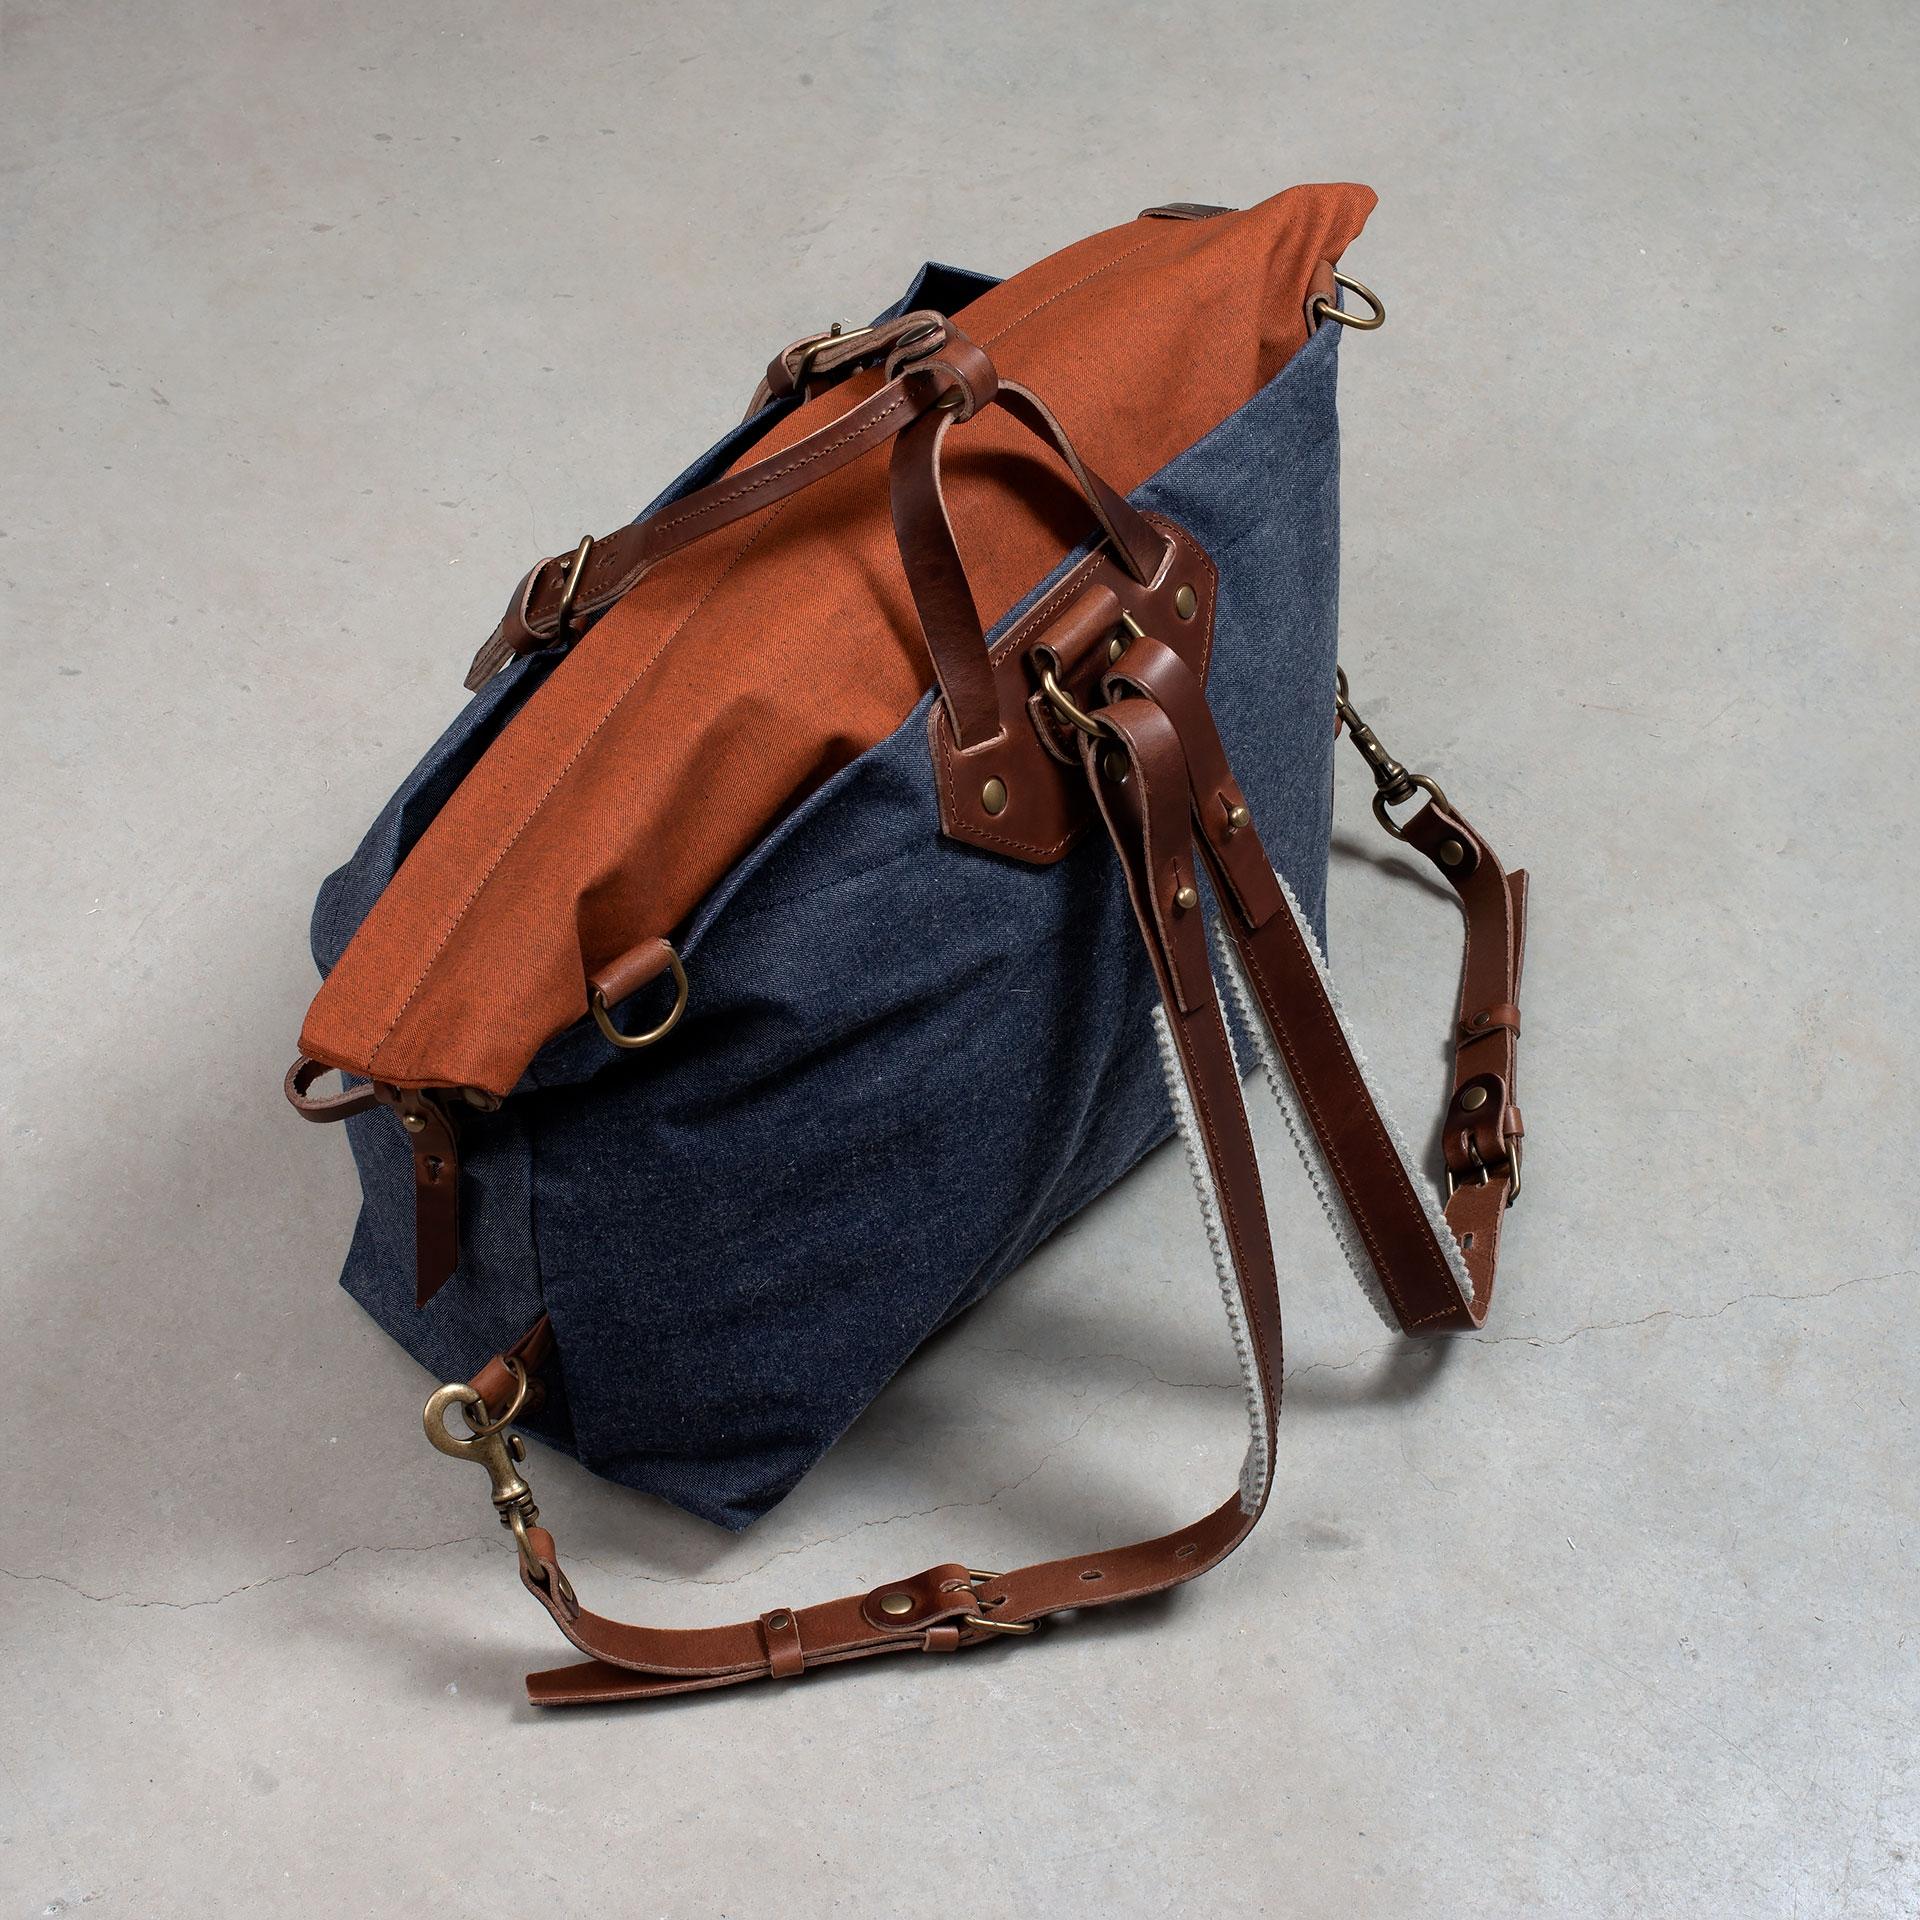 Woody L Backpack - Denim/Terra cotta (image n°6)